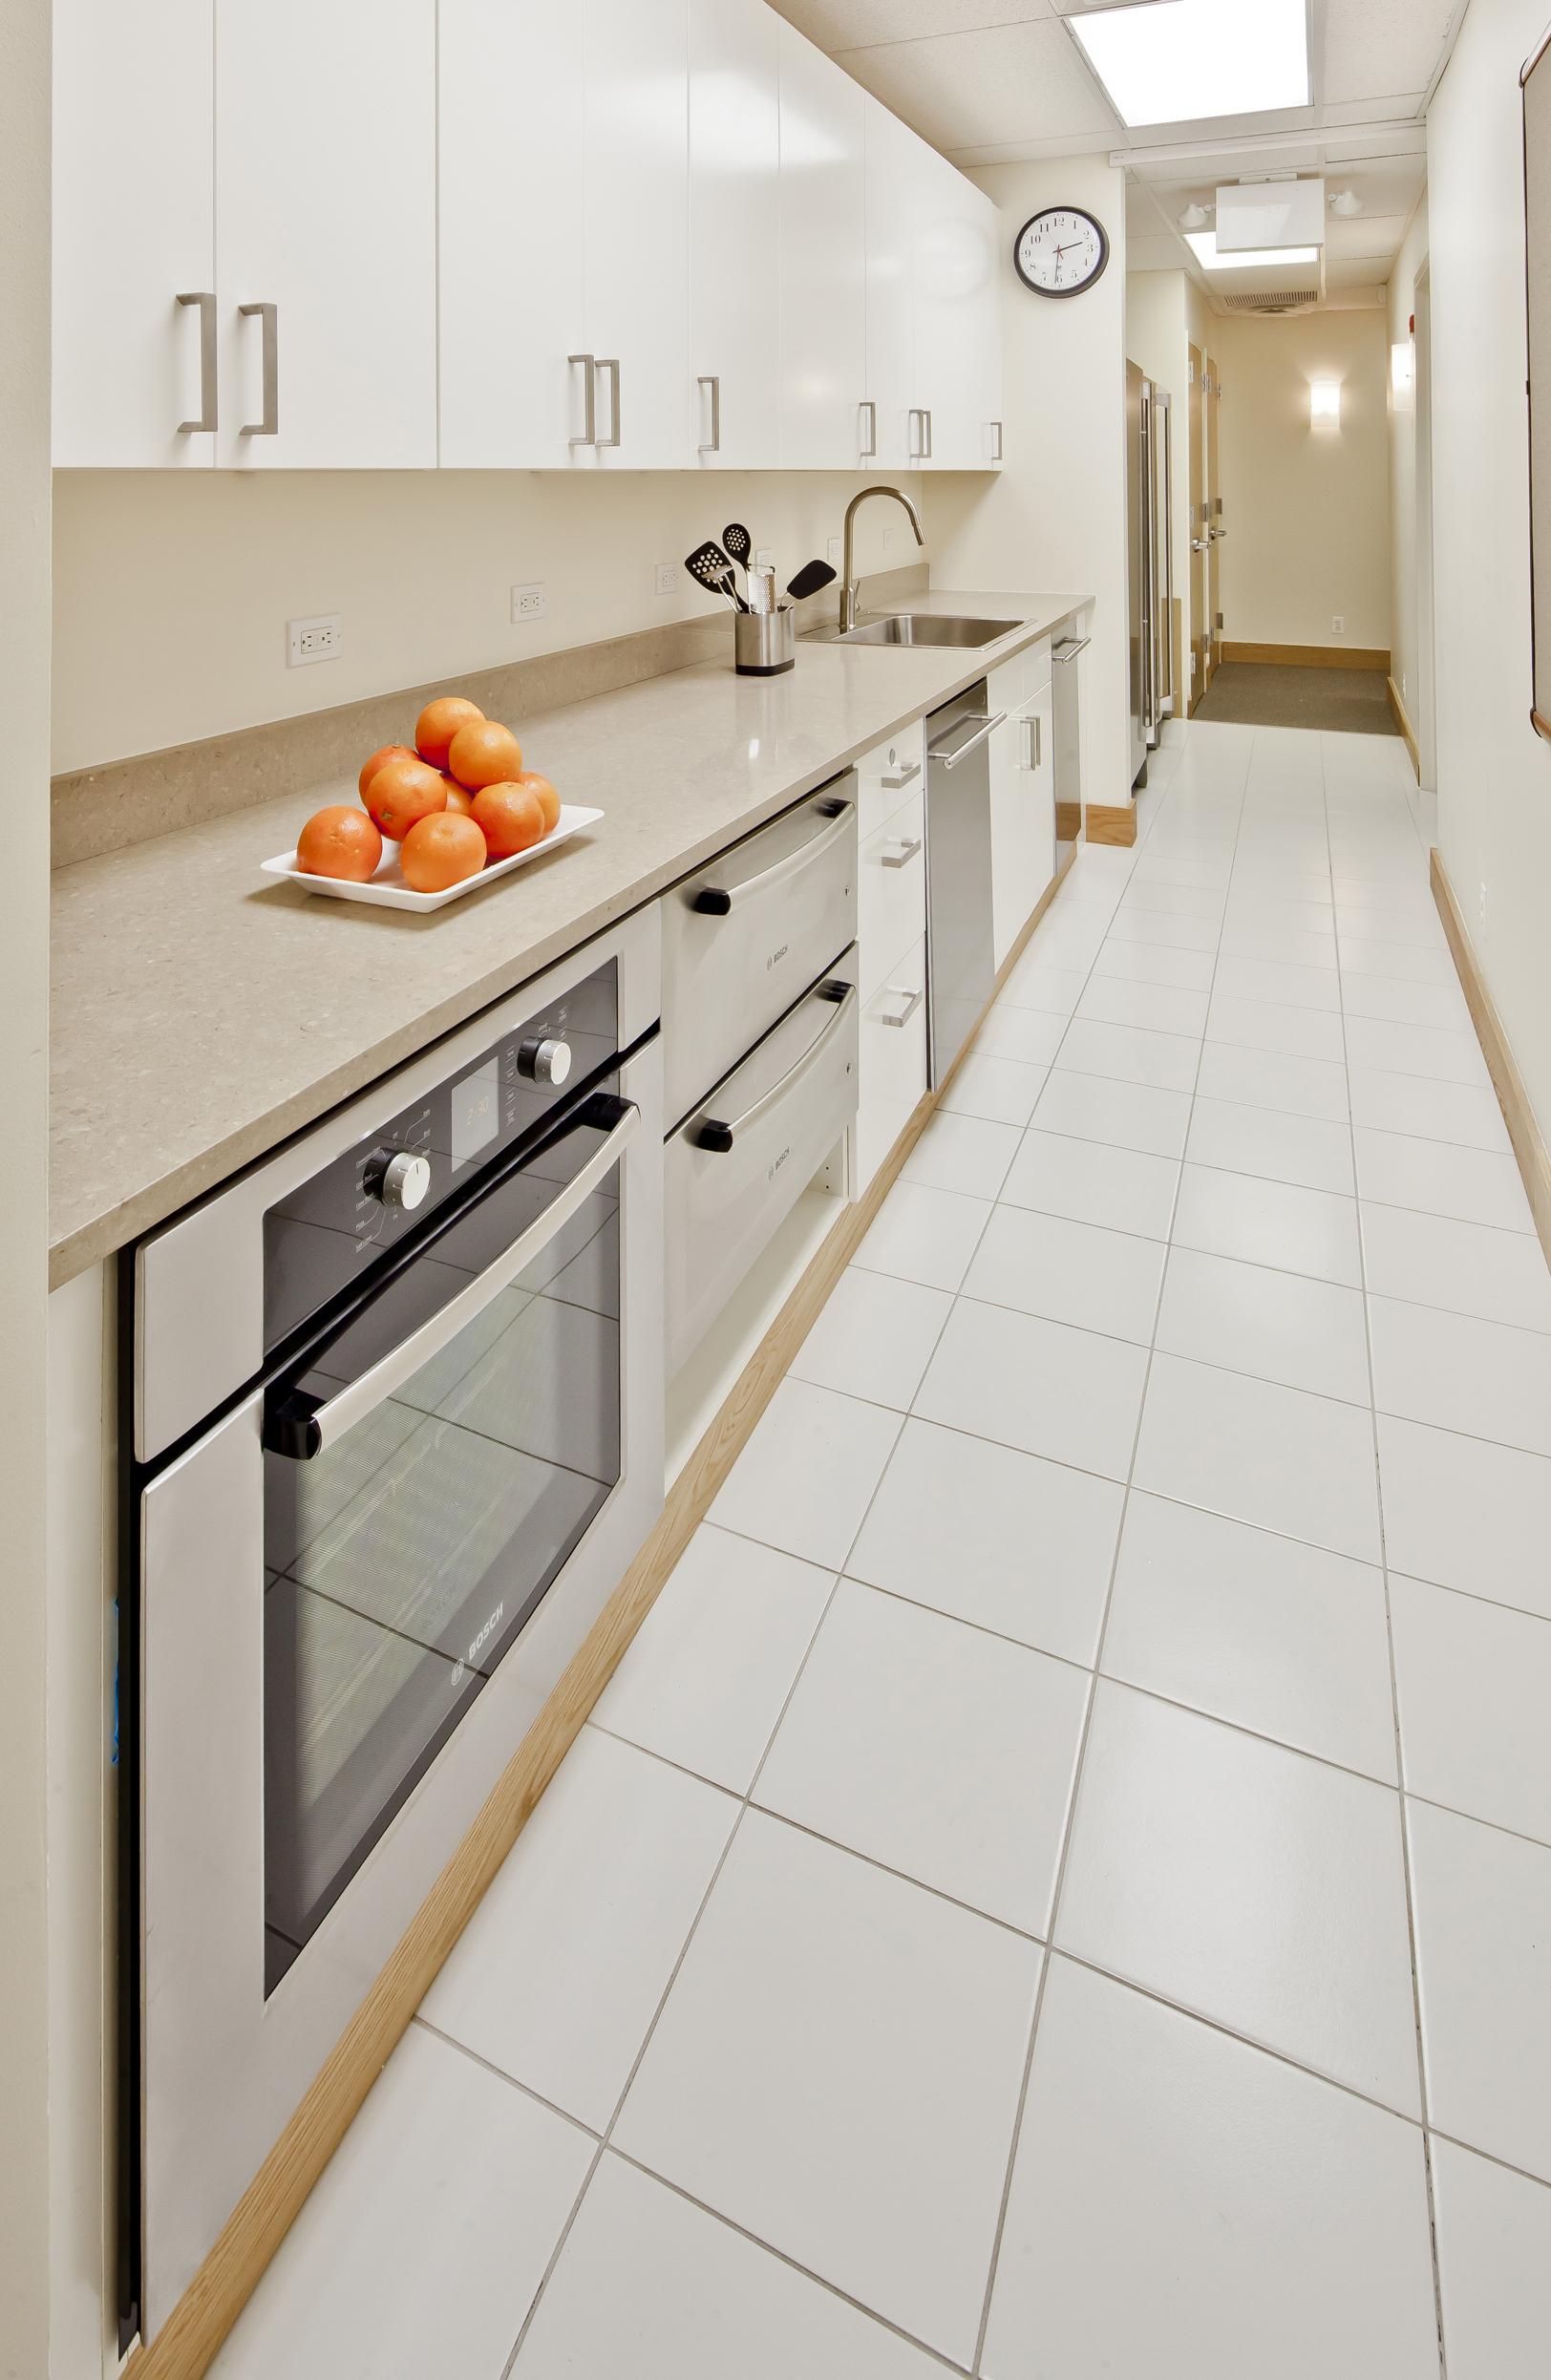 mon_pic_kitchen.JPG